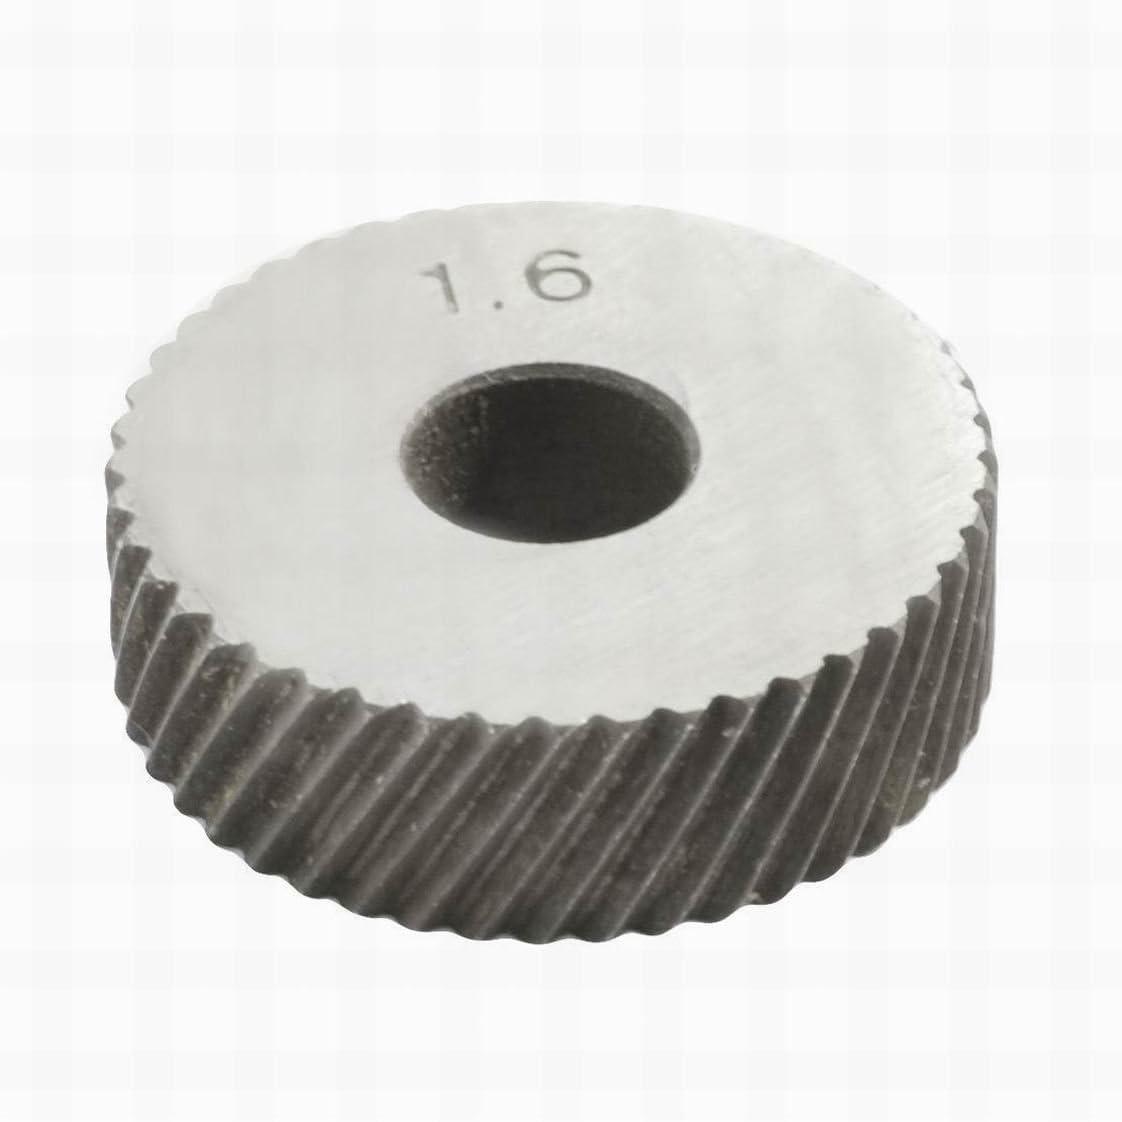 Diagonal Coarse 1.6mm Pitch Linear Knurl Wheel Knurling Tool